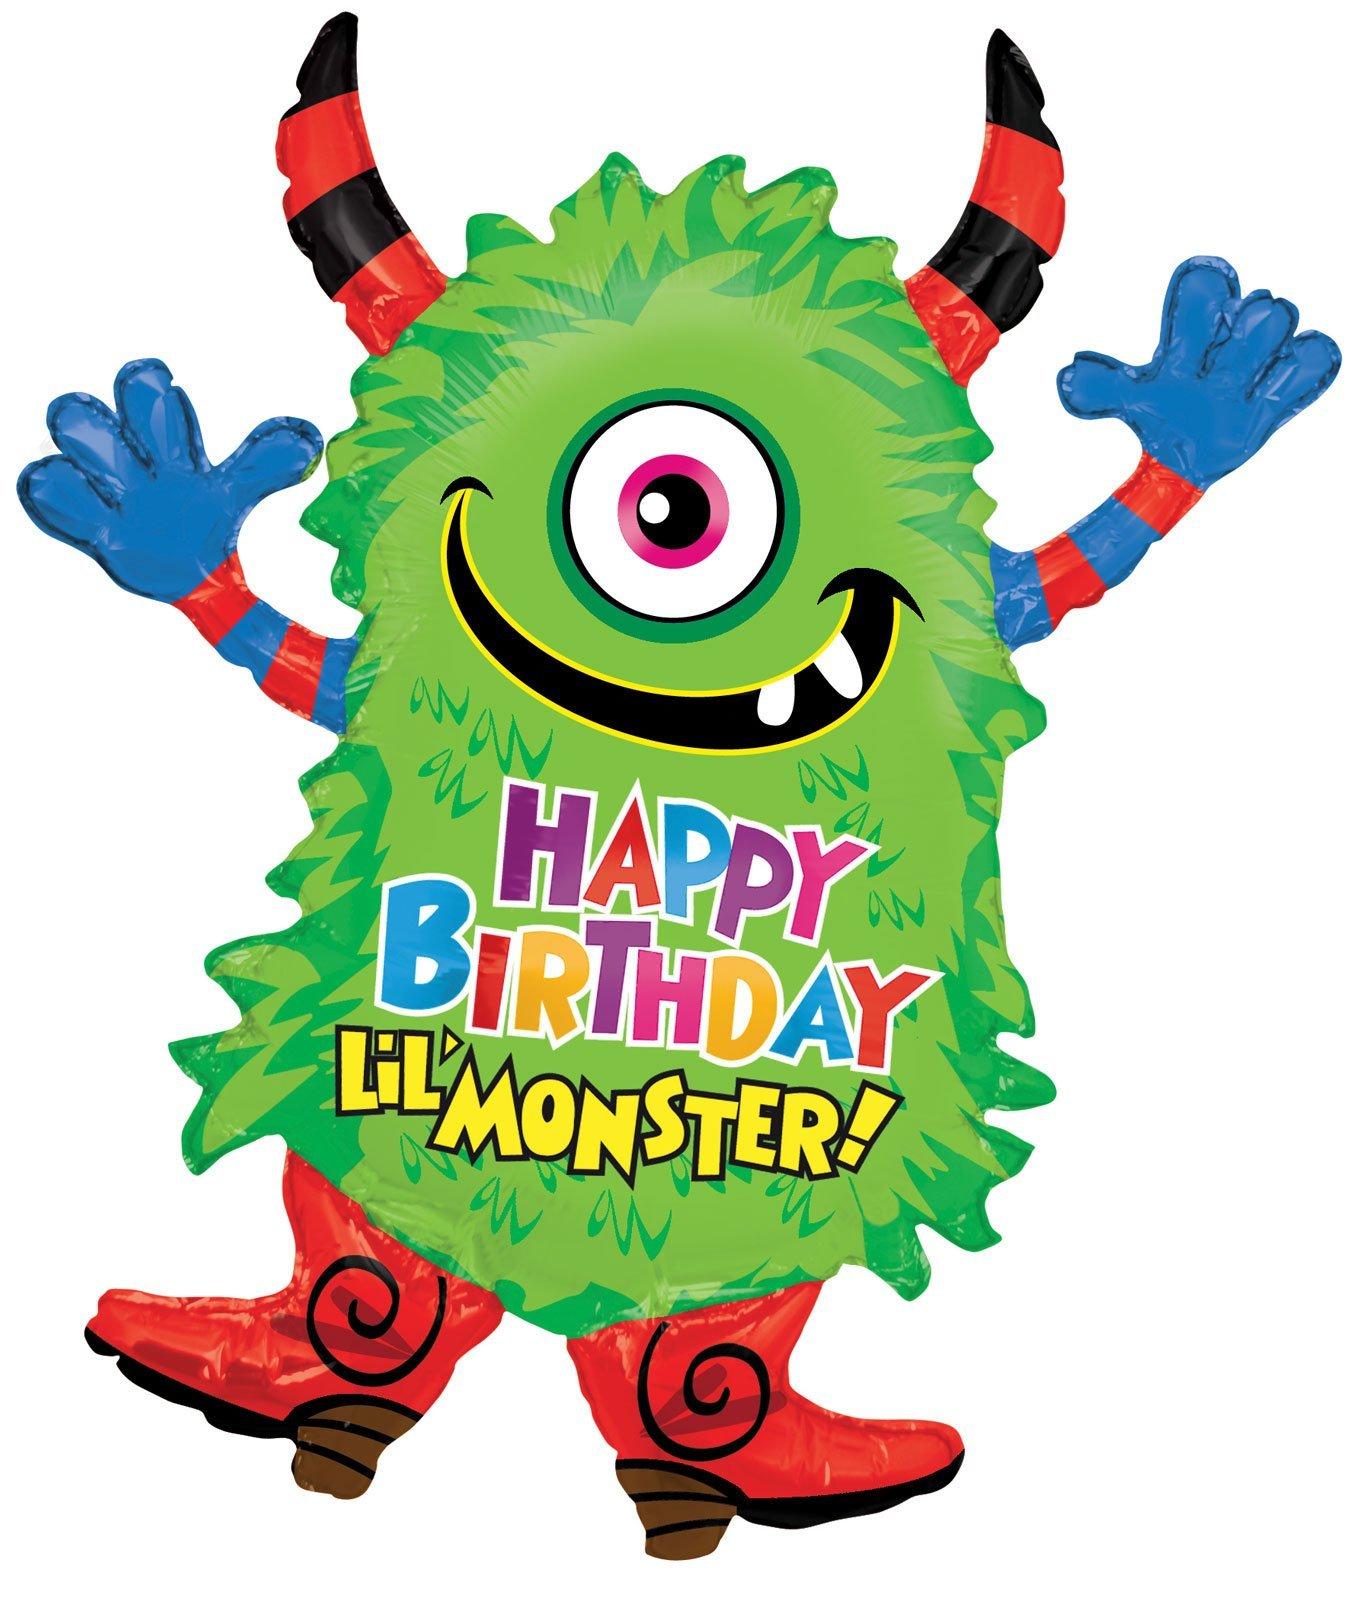 Birthday Monster Jumbo Foil Balloon (Green) Party Accessory